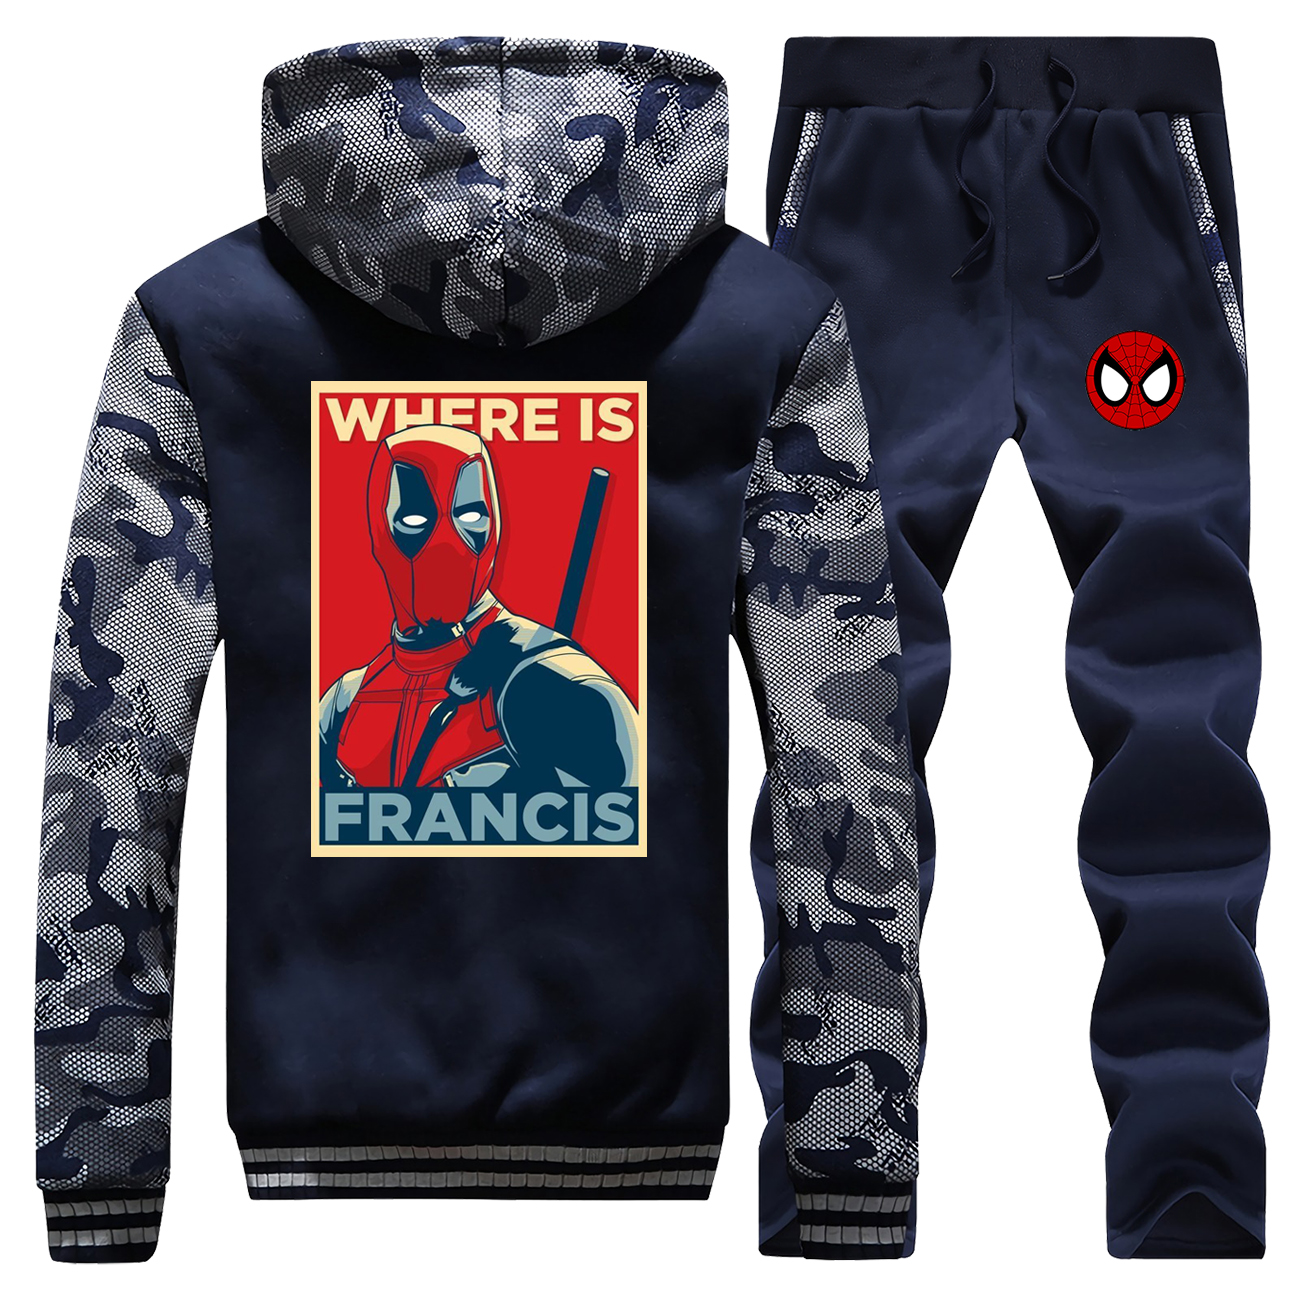 Spider-Man Sportsman Wear Casual Warm Fleece Male Set Deadpool Man Set Where Is Francis Camo Hoodies Set 2019 Winter Hick Jacket